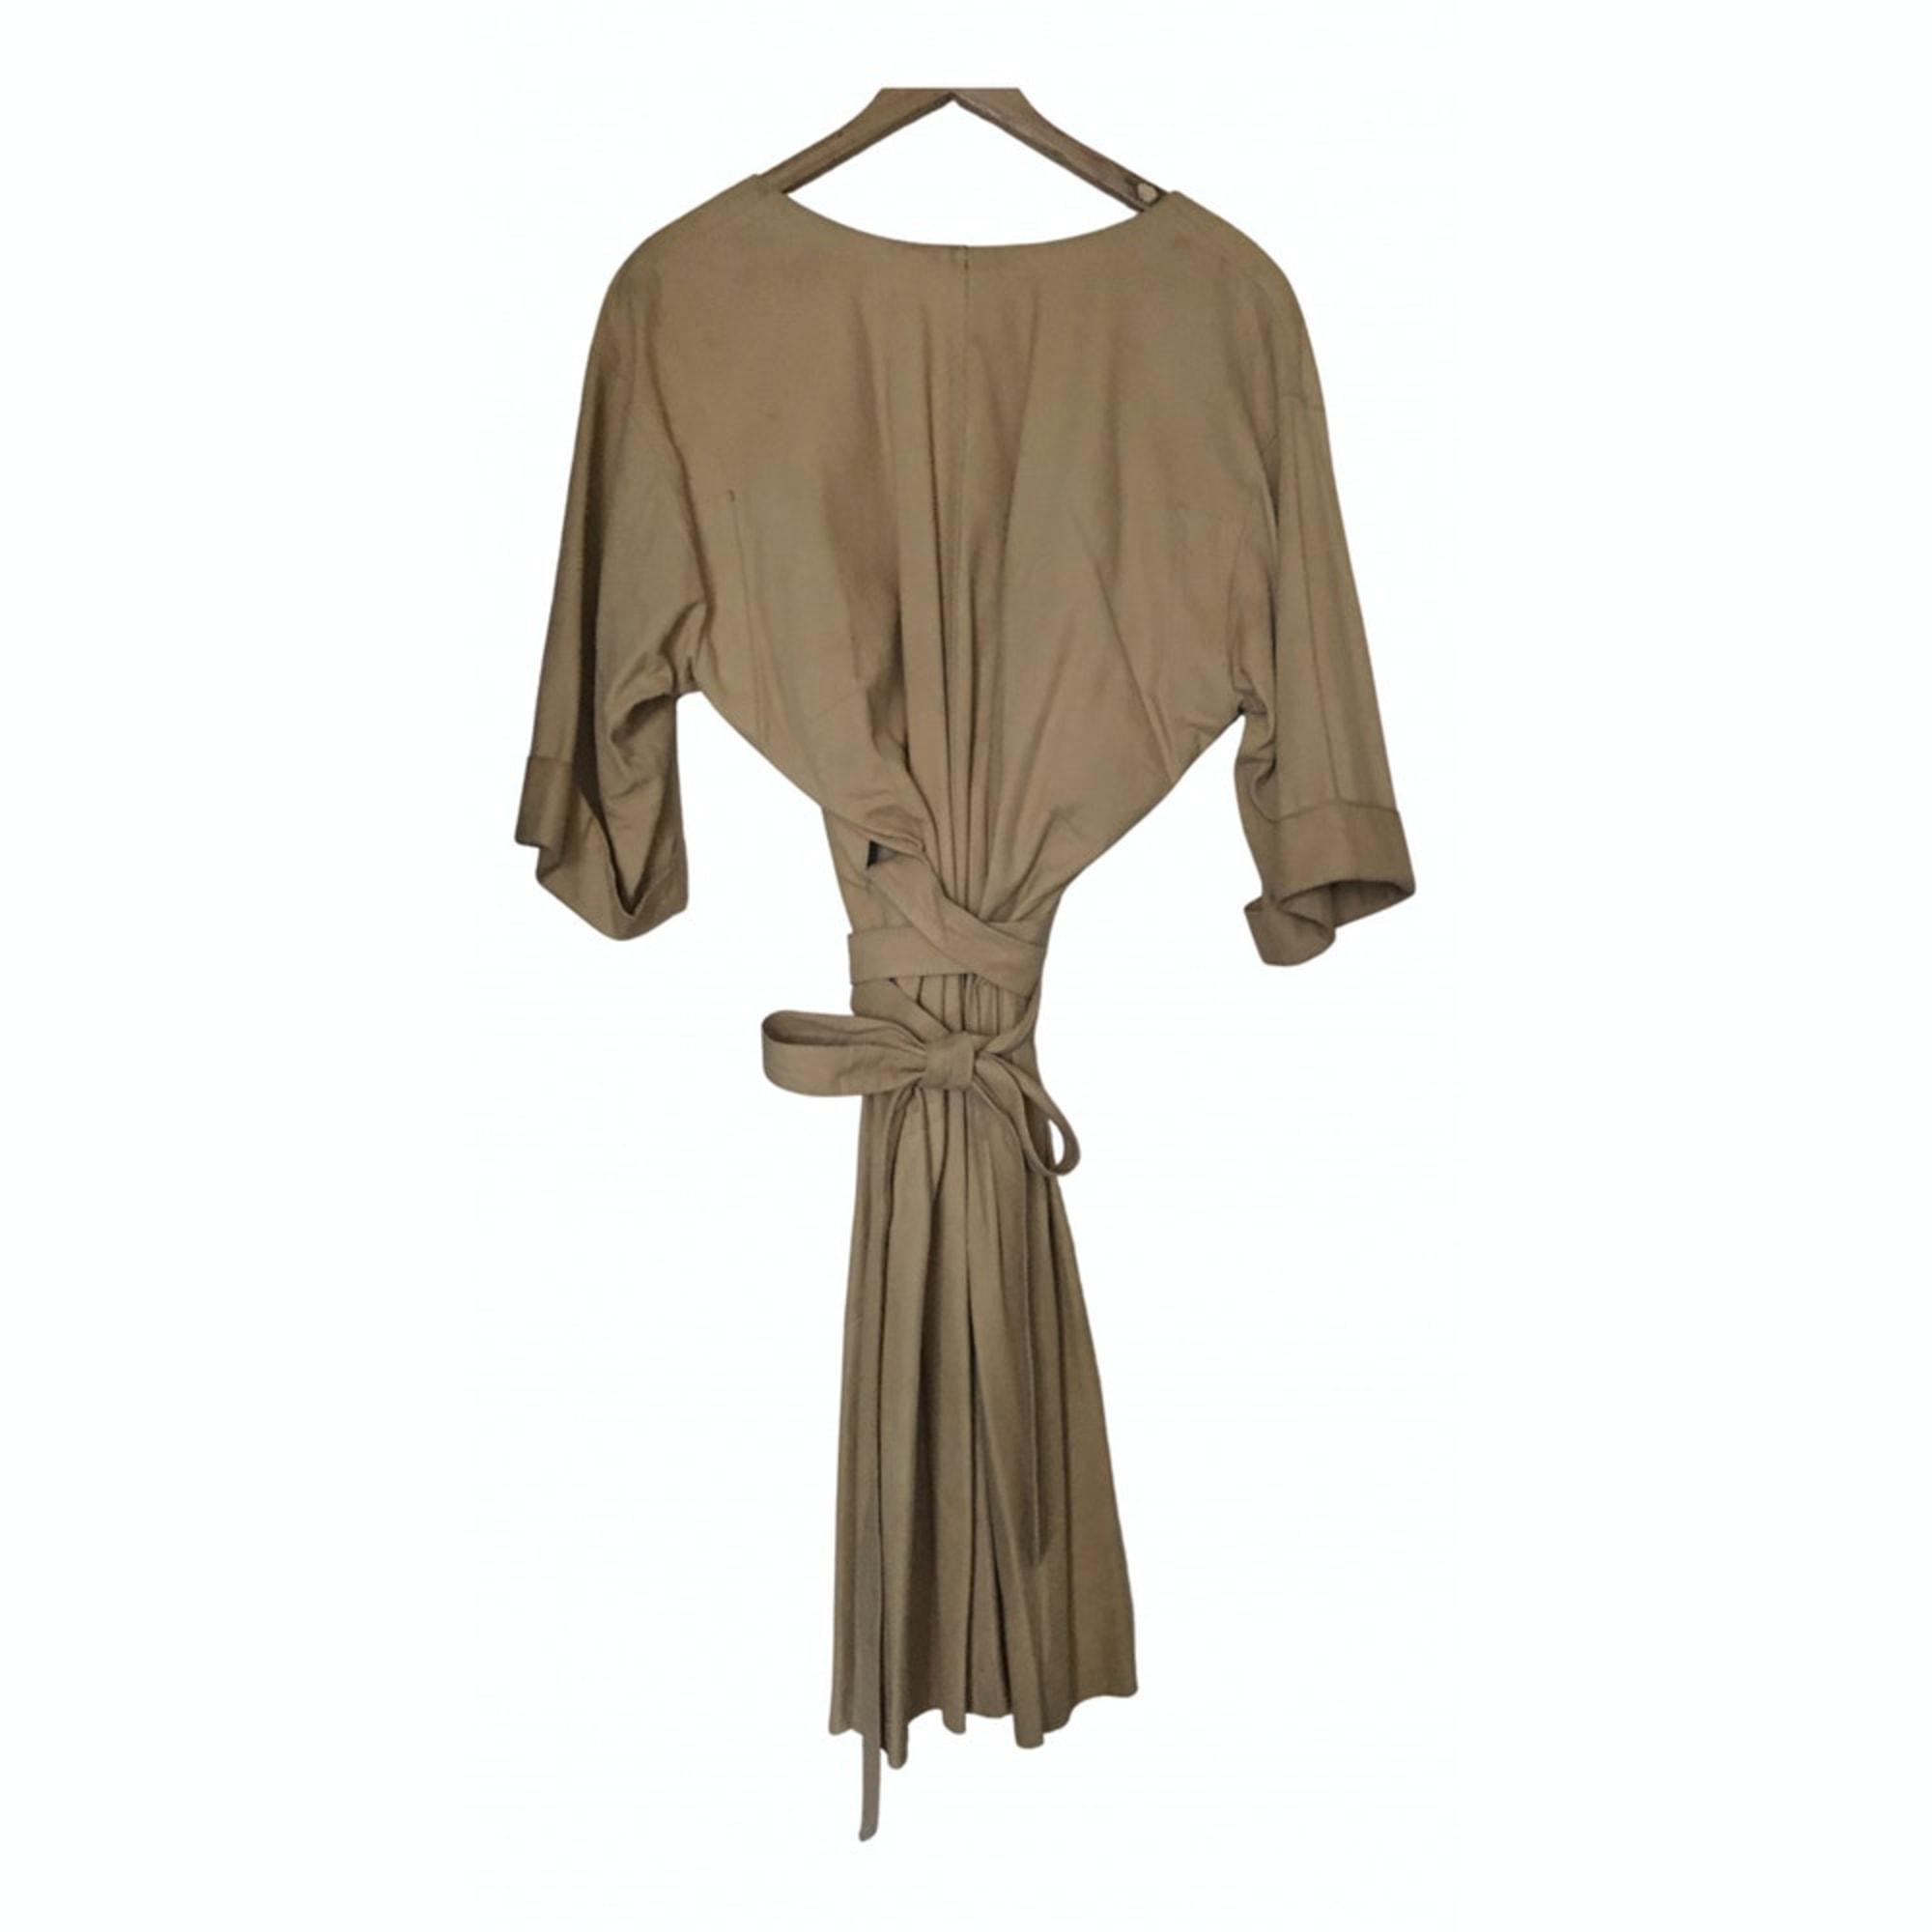 Robe mi-longue MARQUE INCONNUE Beige, camel